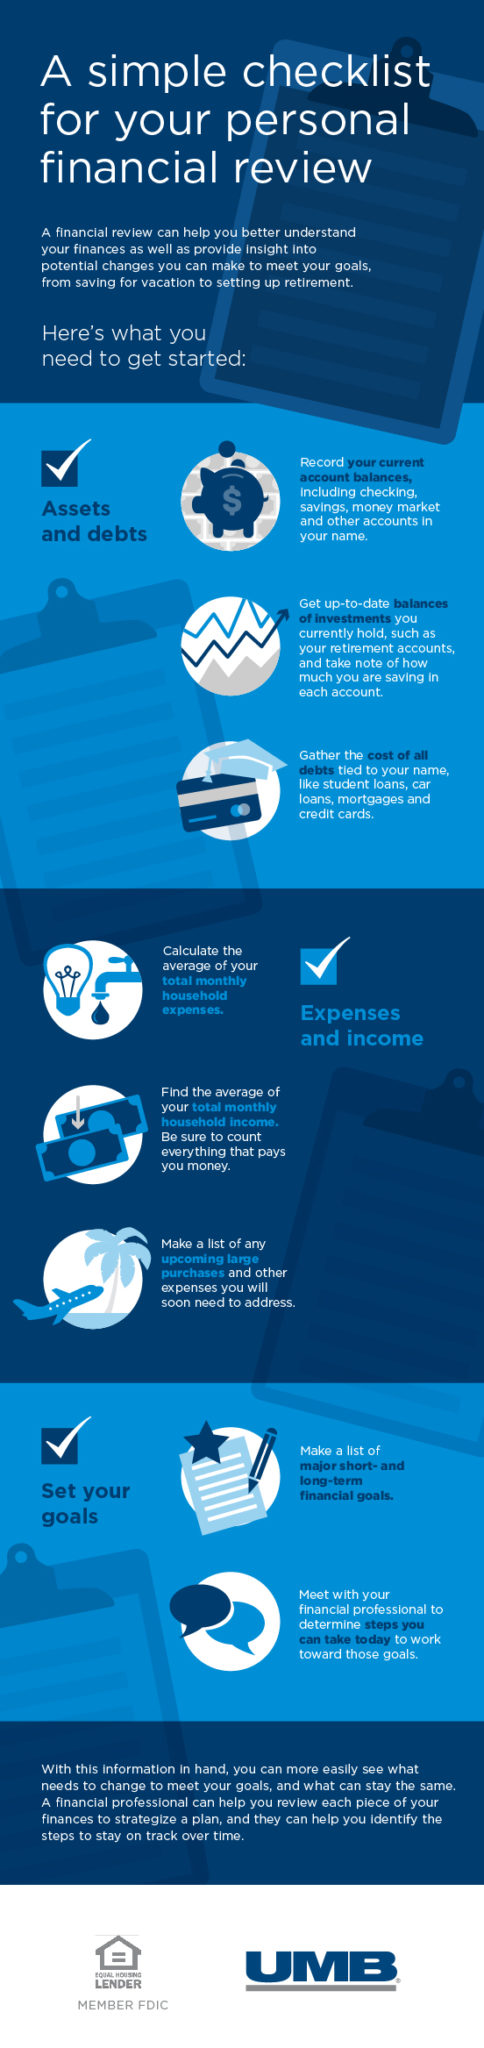 Financial review preparation